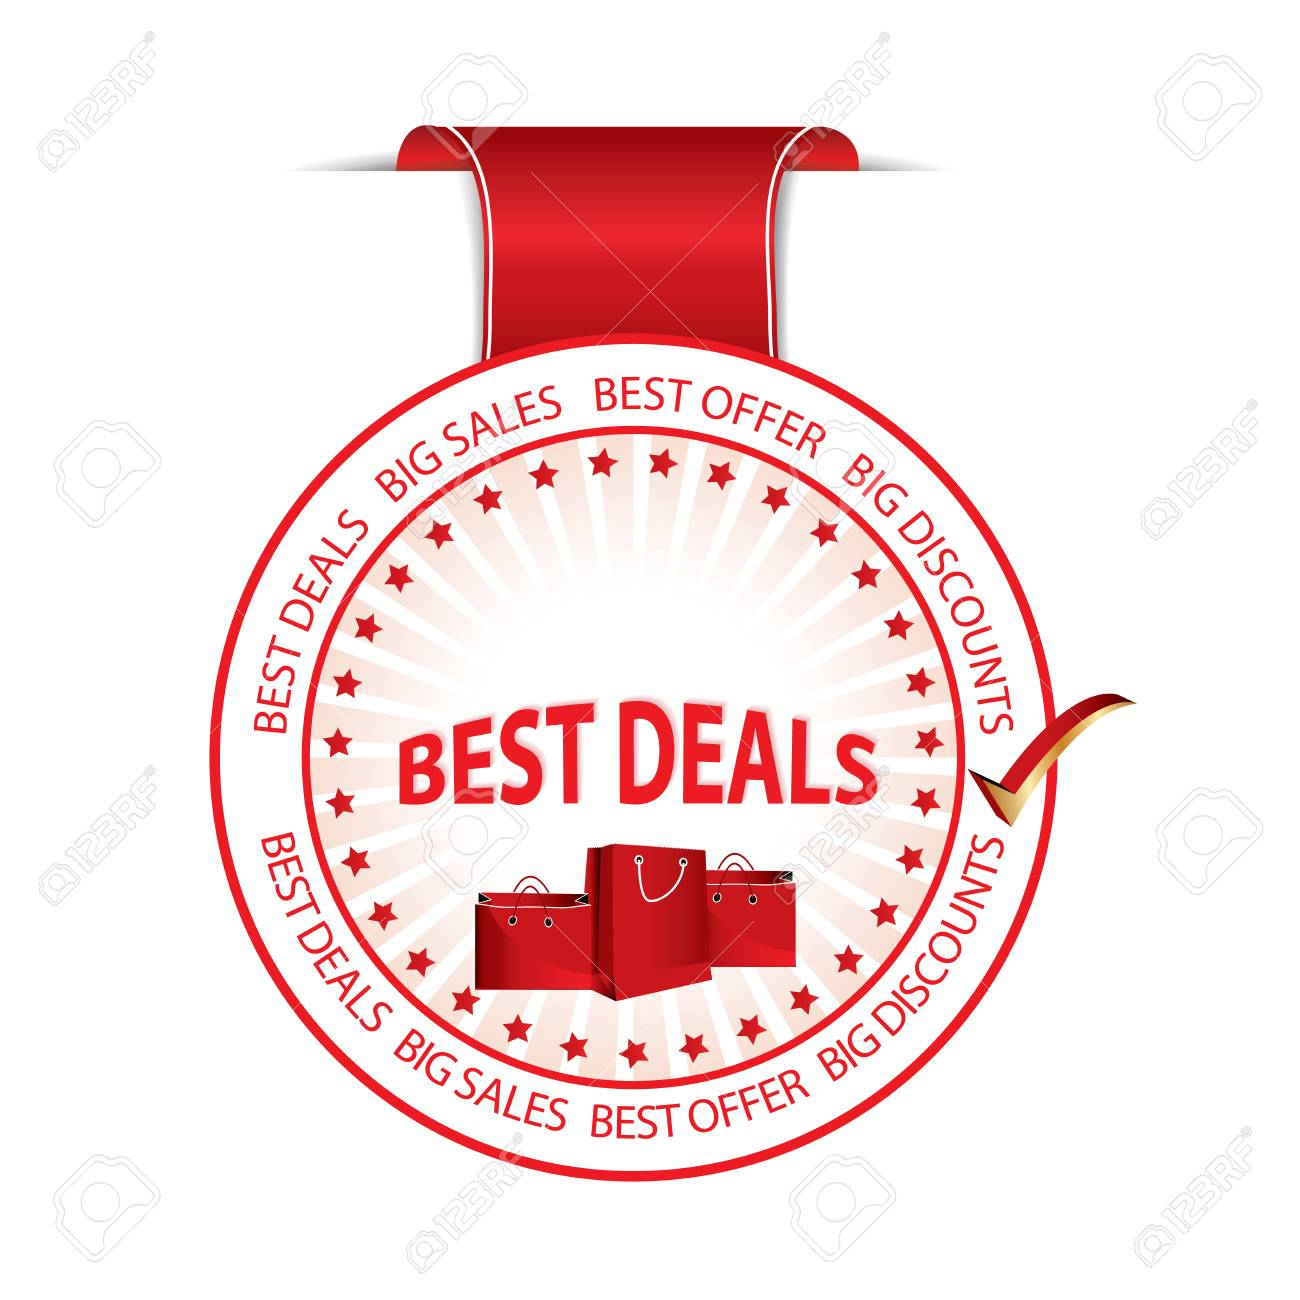 red deals offer